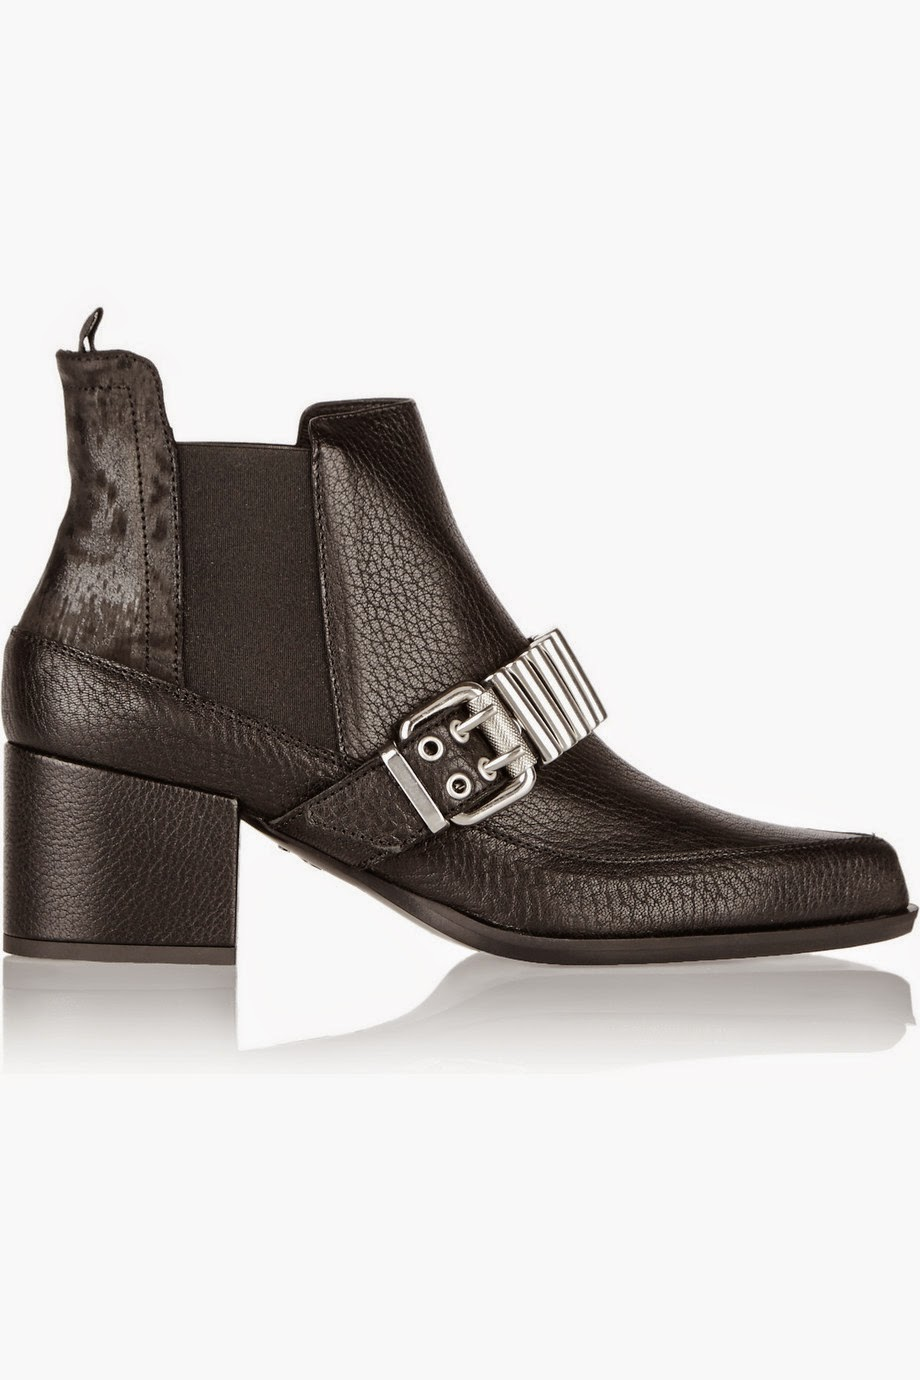 mcq metal ankle boots, alexander mcqueen black, McQ chelsea boots, Alexander McQueen black chelsea boot,